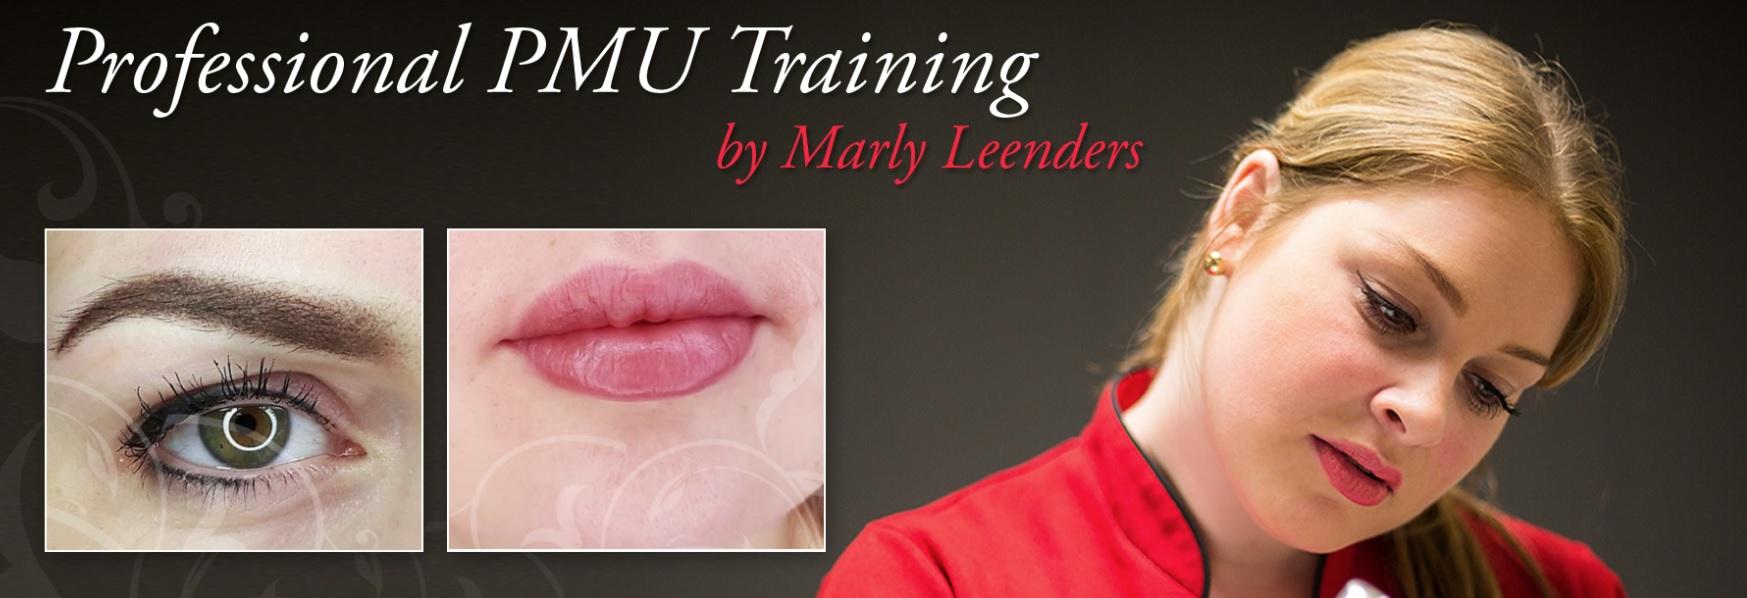 pmu-training-marly-leenders